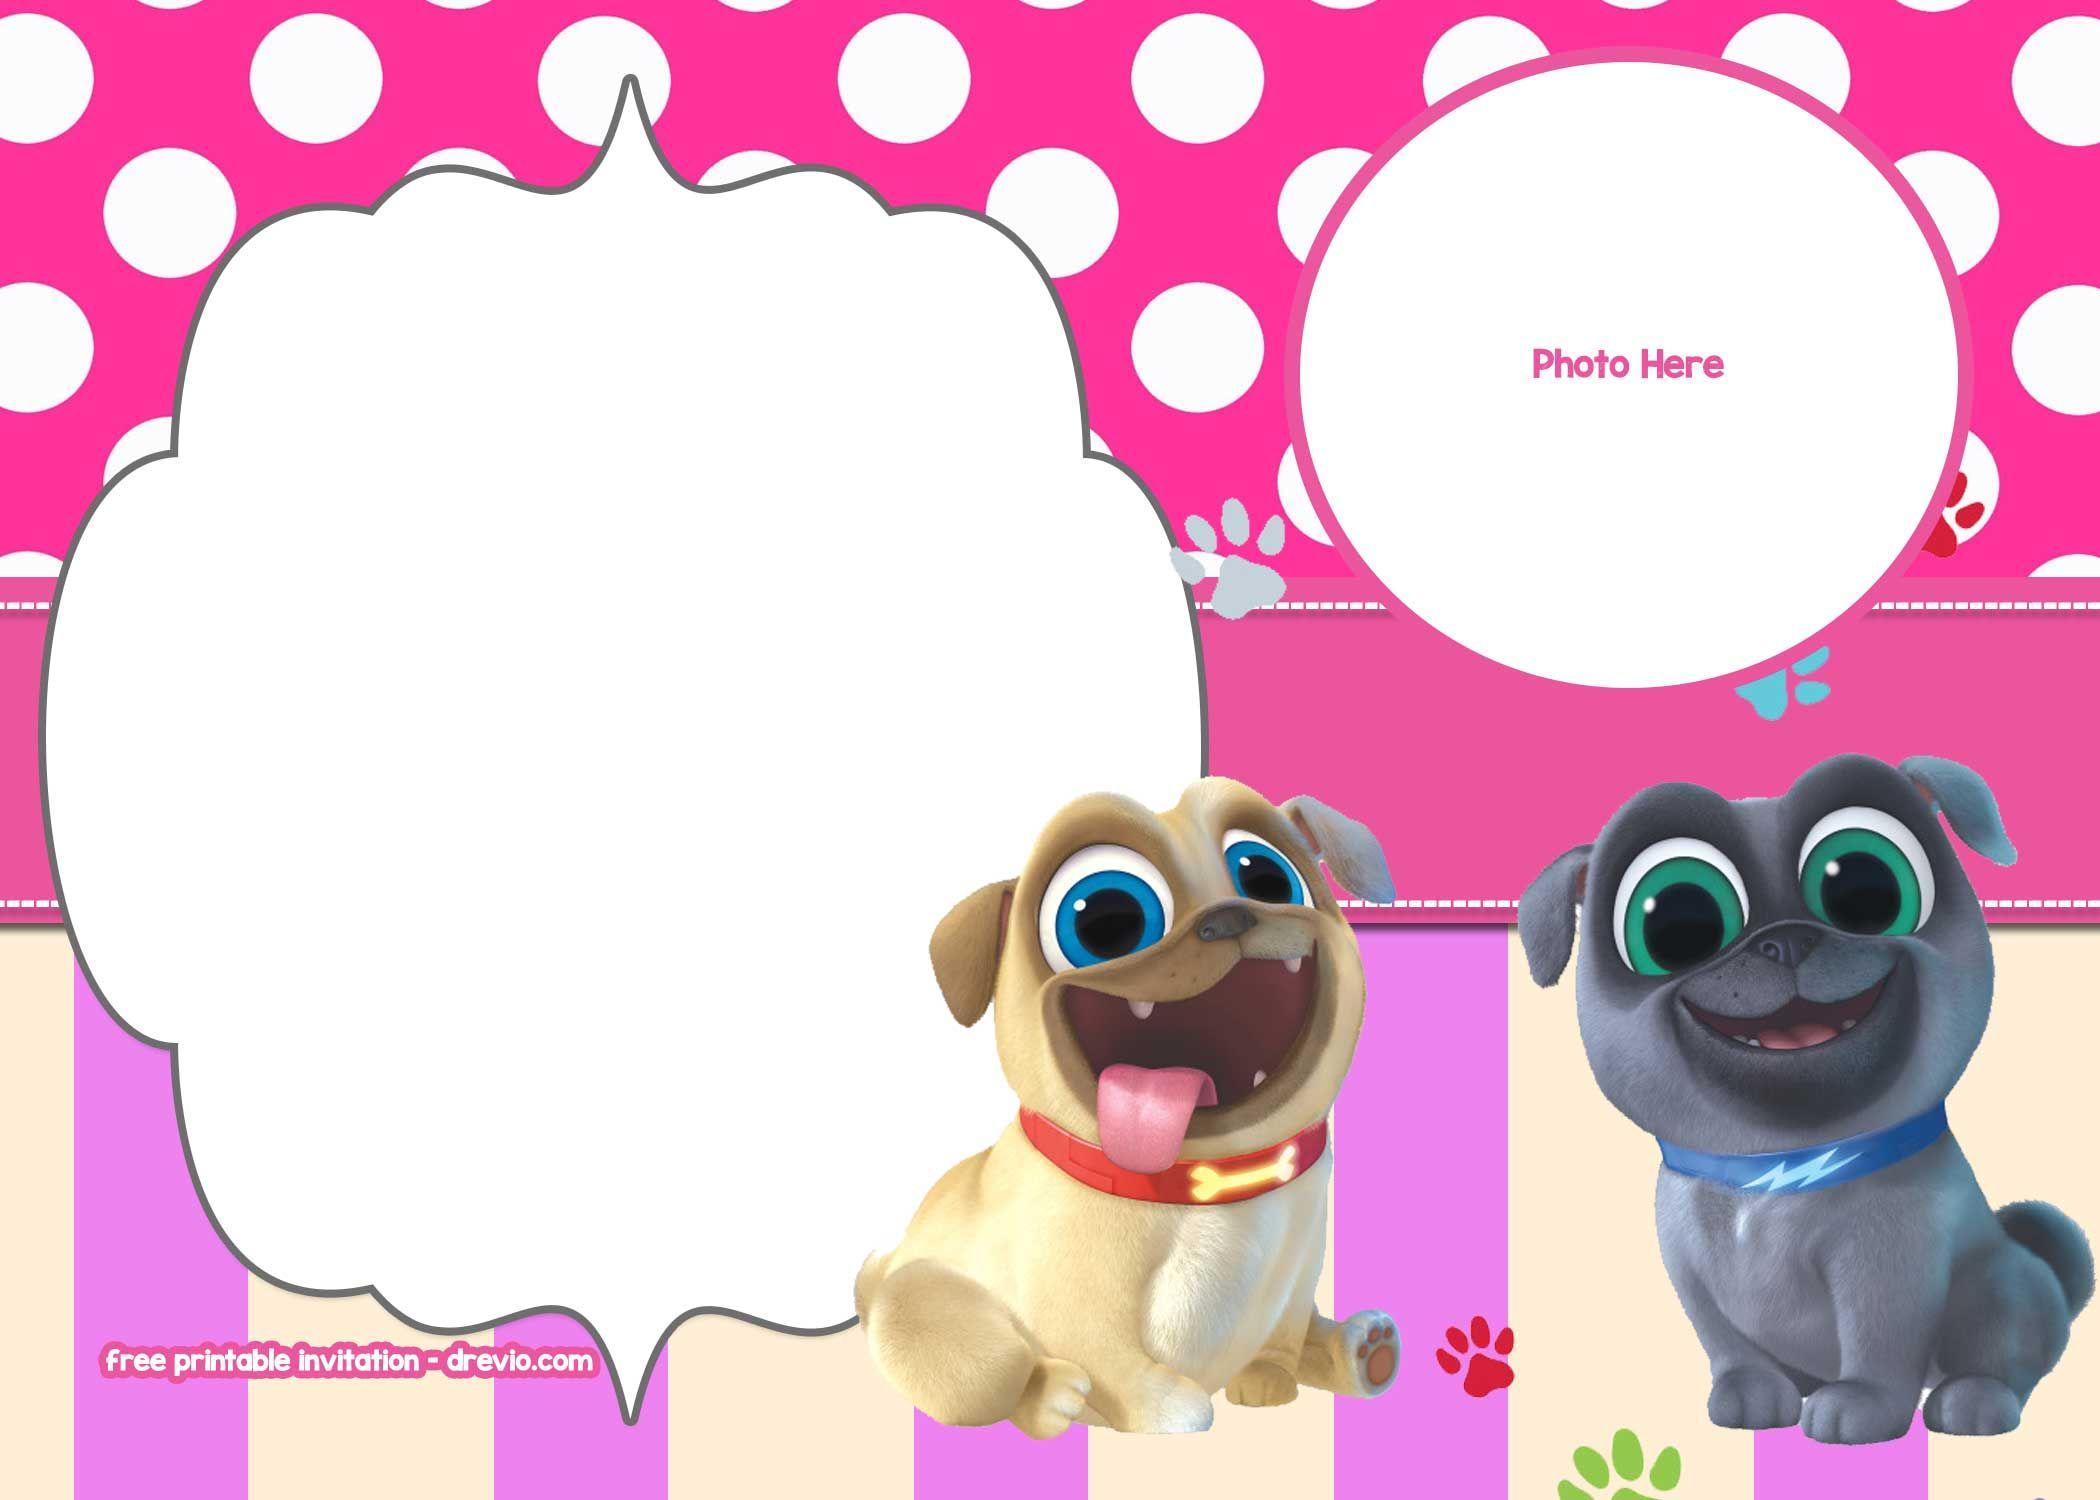 Free Disney Puppy Dog Pals Invitation | Free Printable Birthday - Free Printable Puppy Dog Birthday Invitations